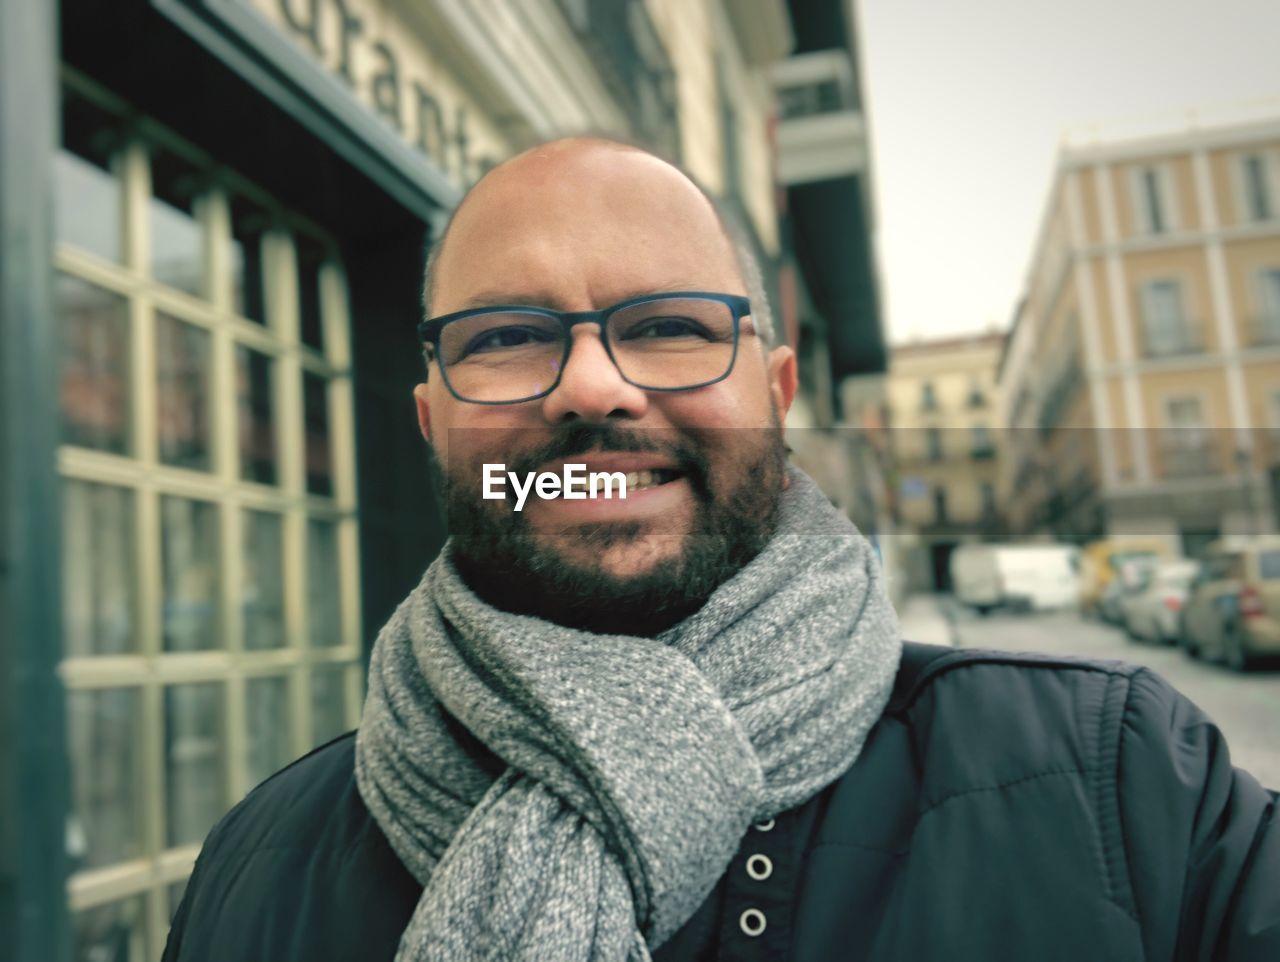 Portrait of man wearing eyeglasses in city during winter